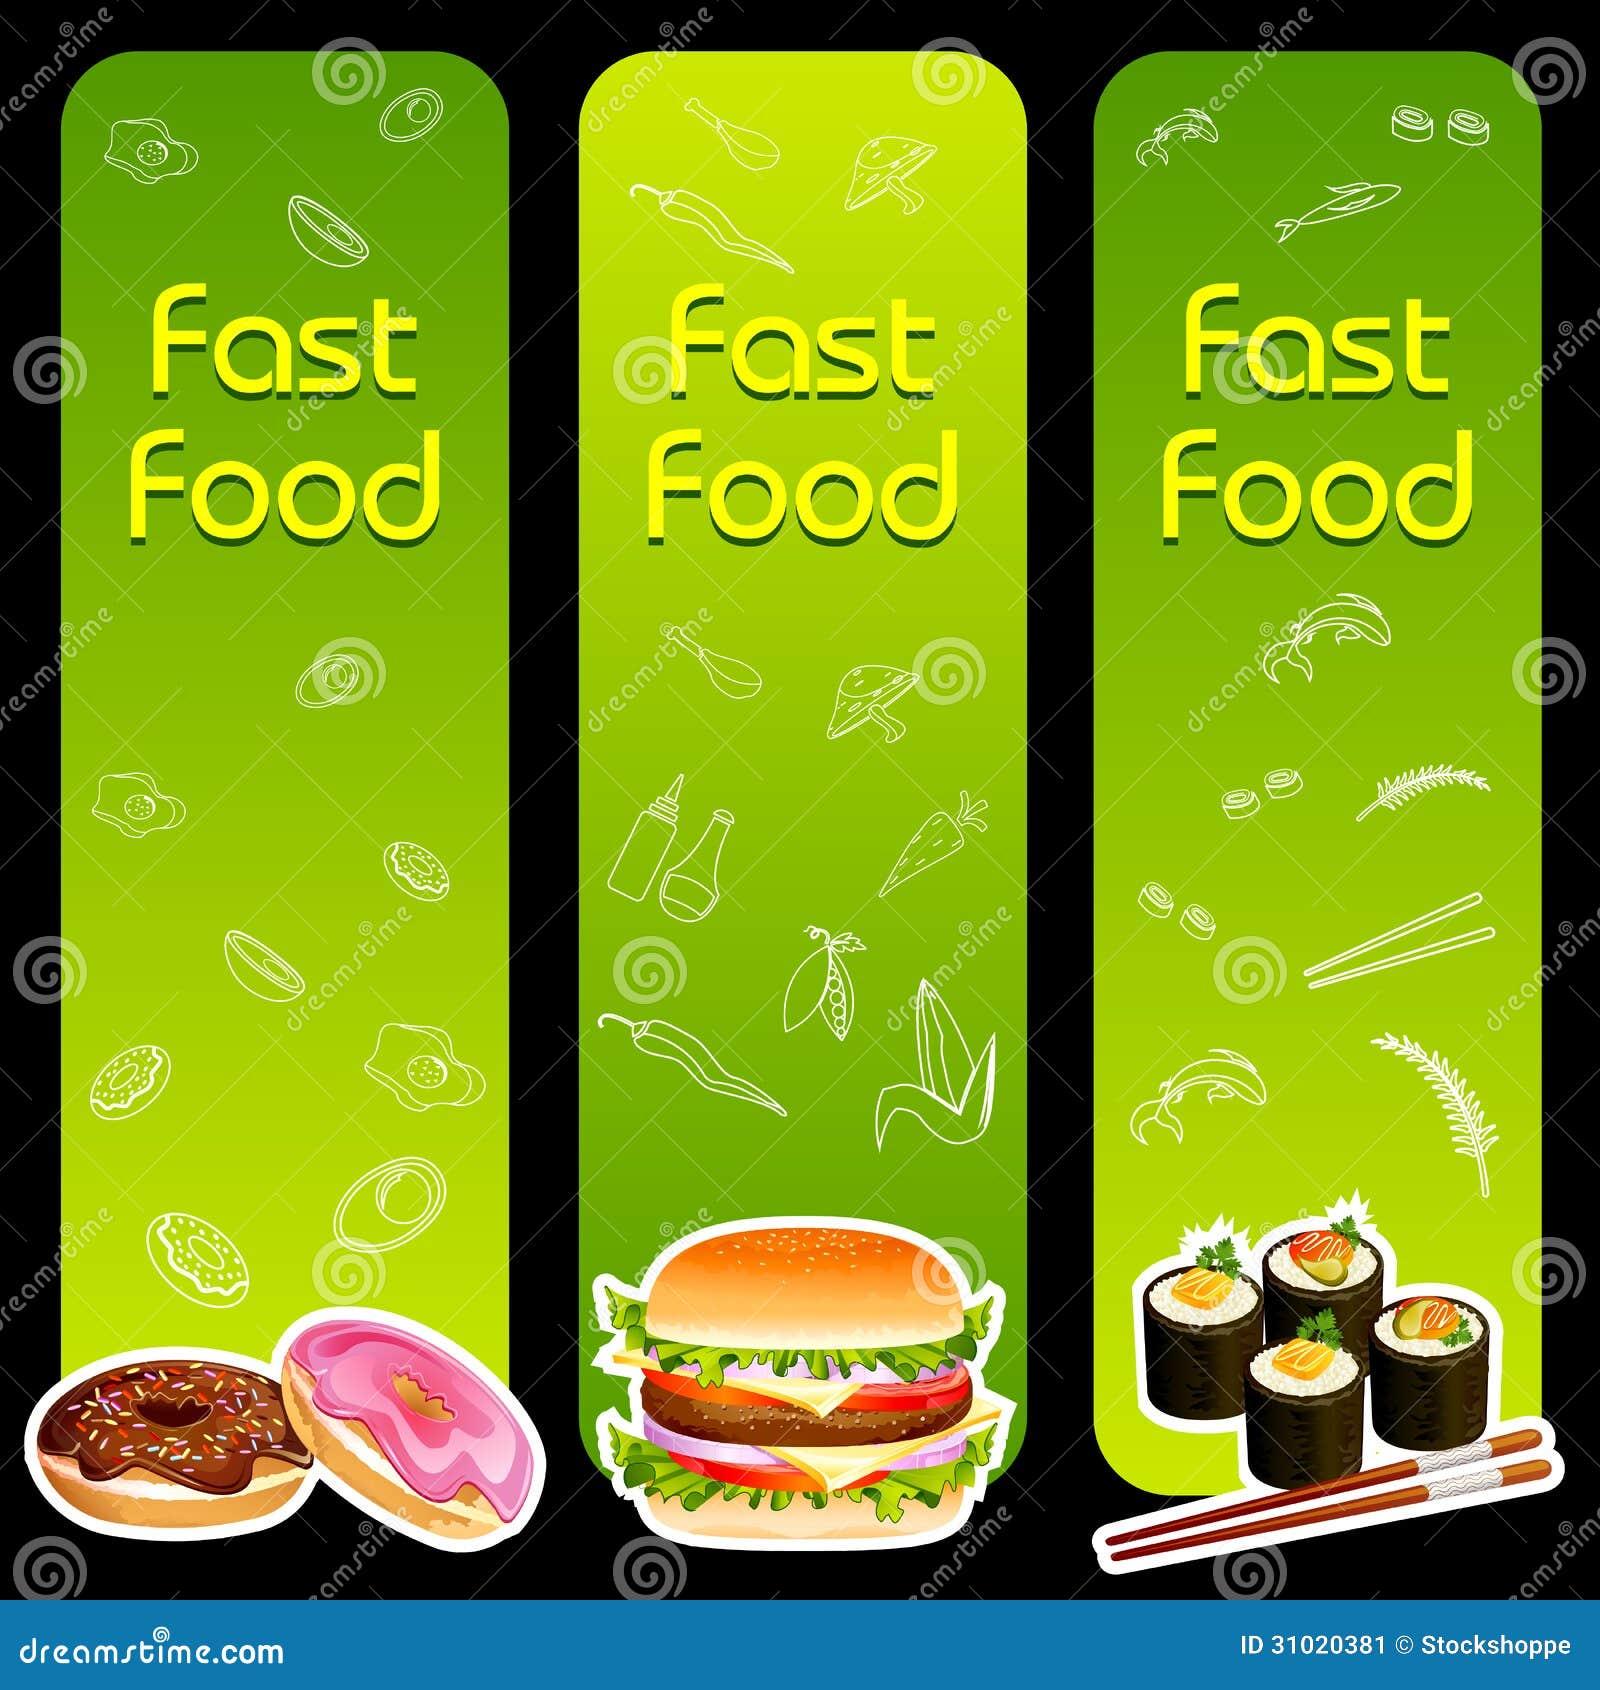 Food Menu Template  Food Menu Templates Free